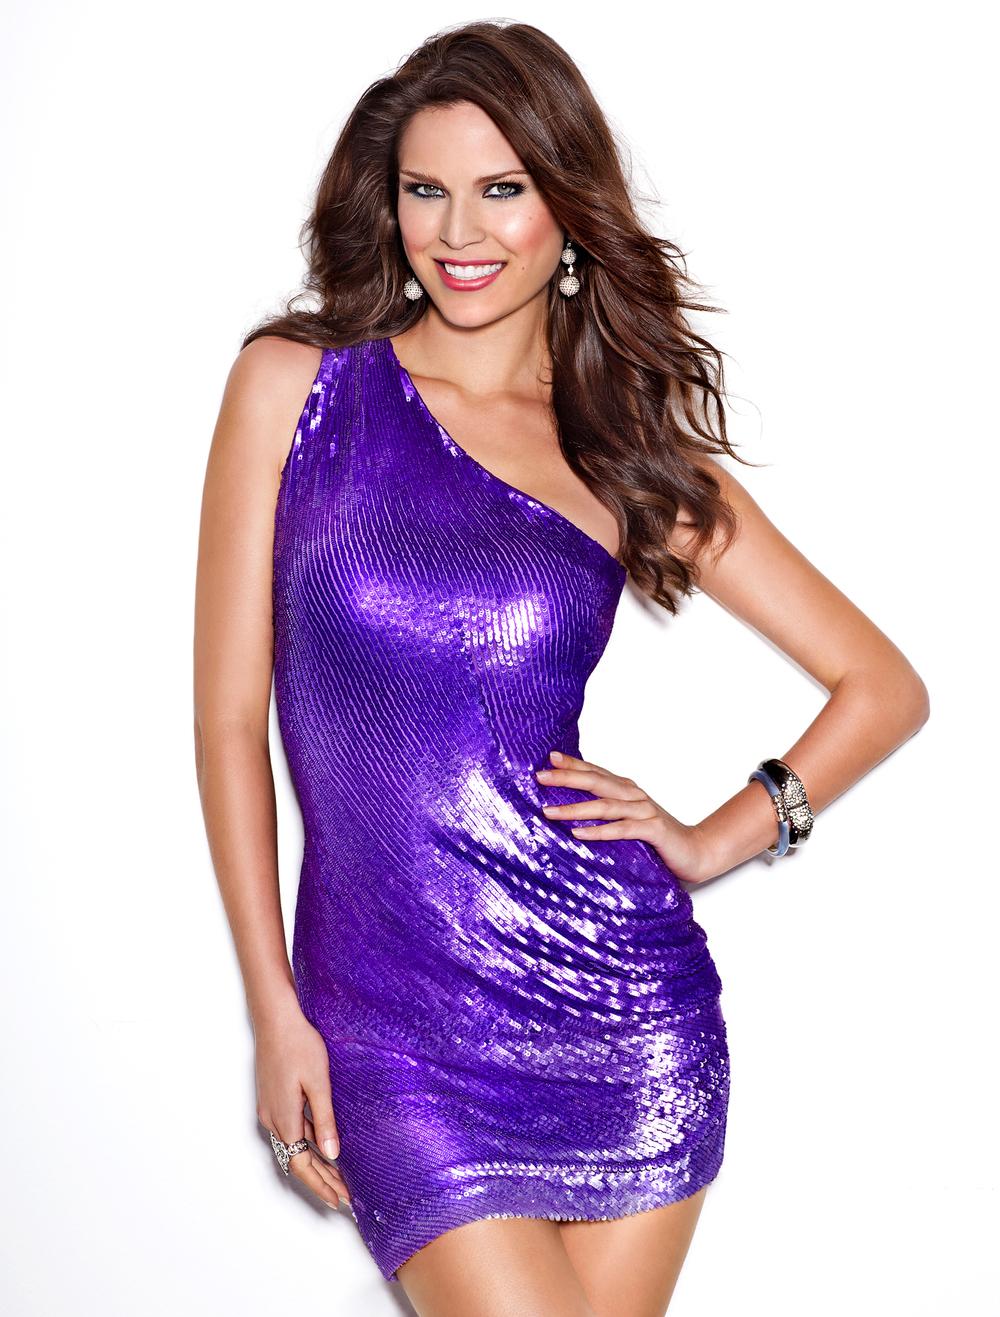 Cosmopolitan Magazine cover,Beauty, Fashion, digital Retouching,Beauty,Models,Celebrities.jpg